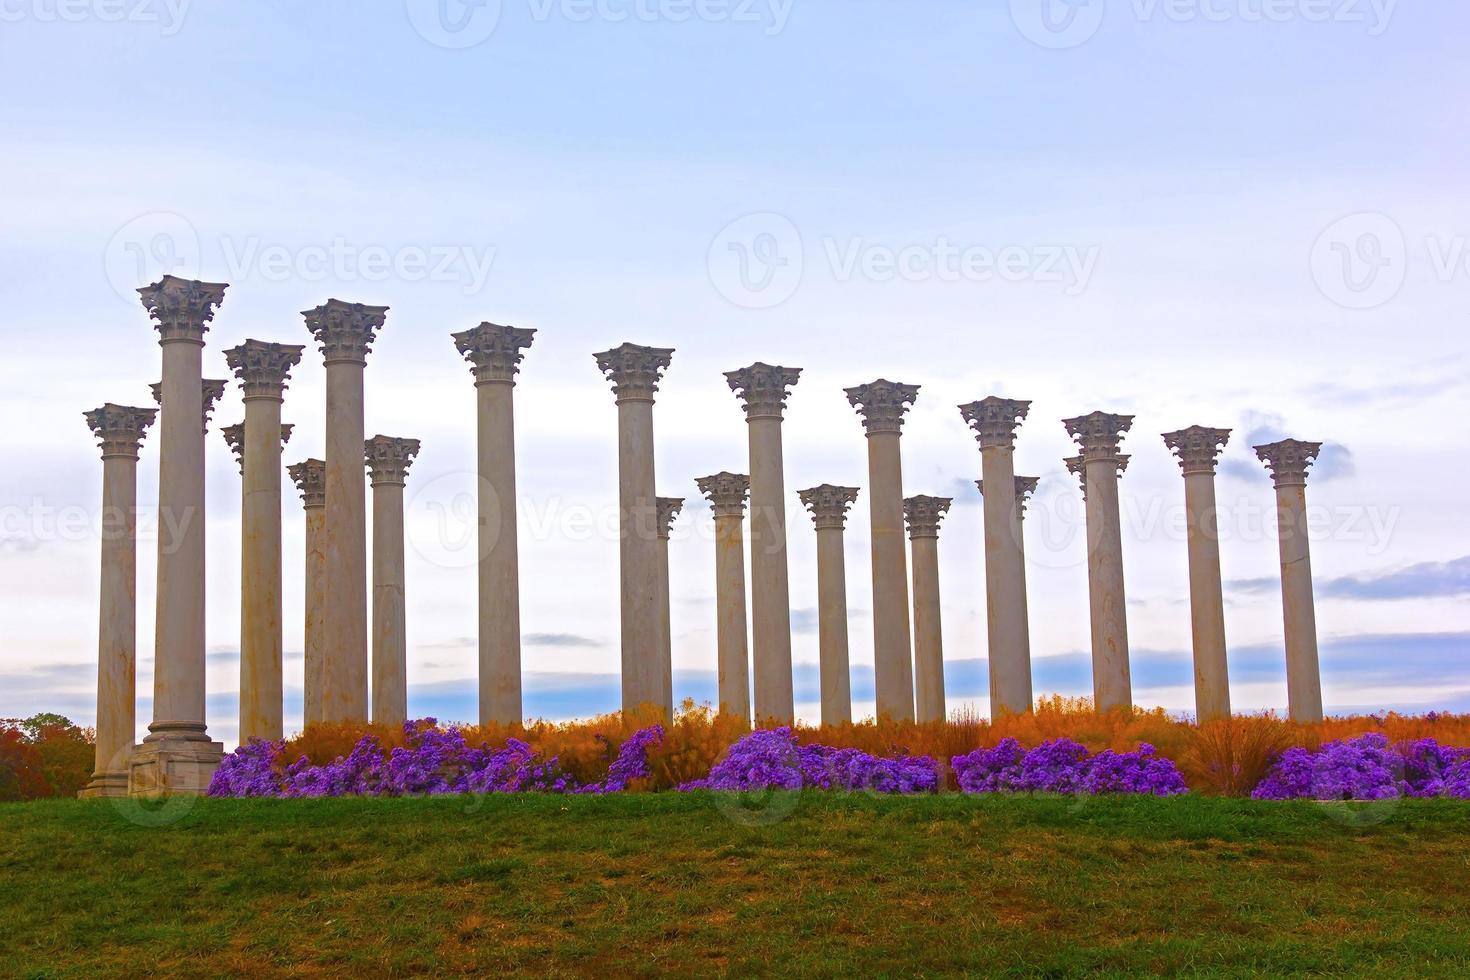 National Capitol Columns at sunset. photo